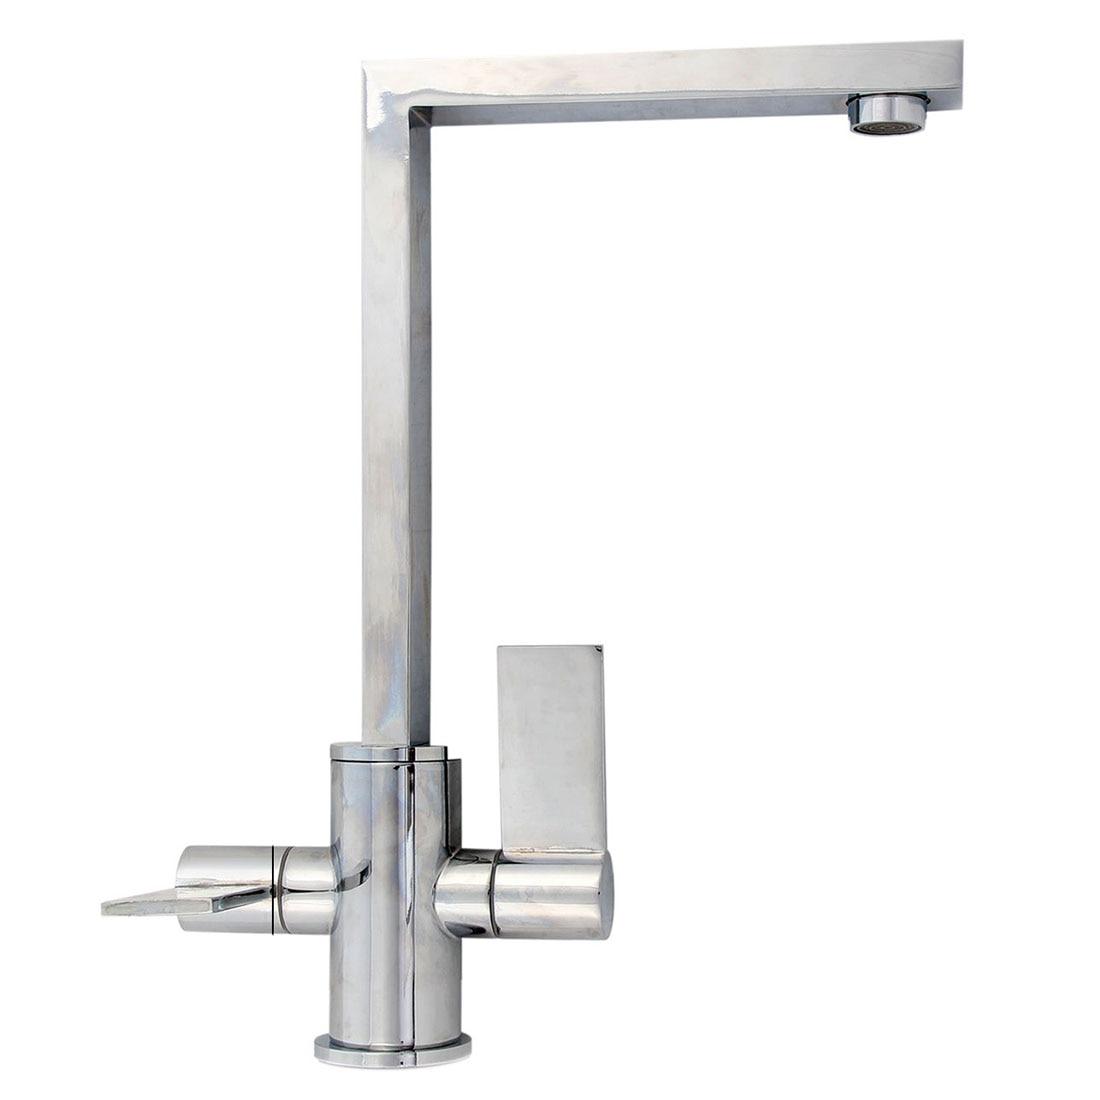 360Mixer Tap Kitchen Sink Modern Angular Chrome Dual Lever Streamlined NEW